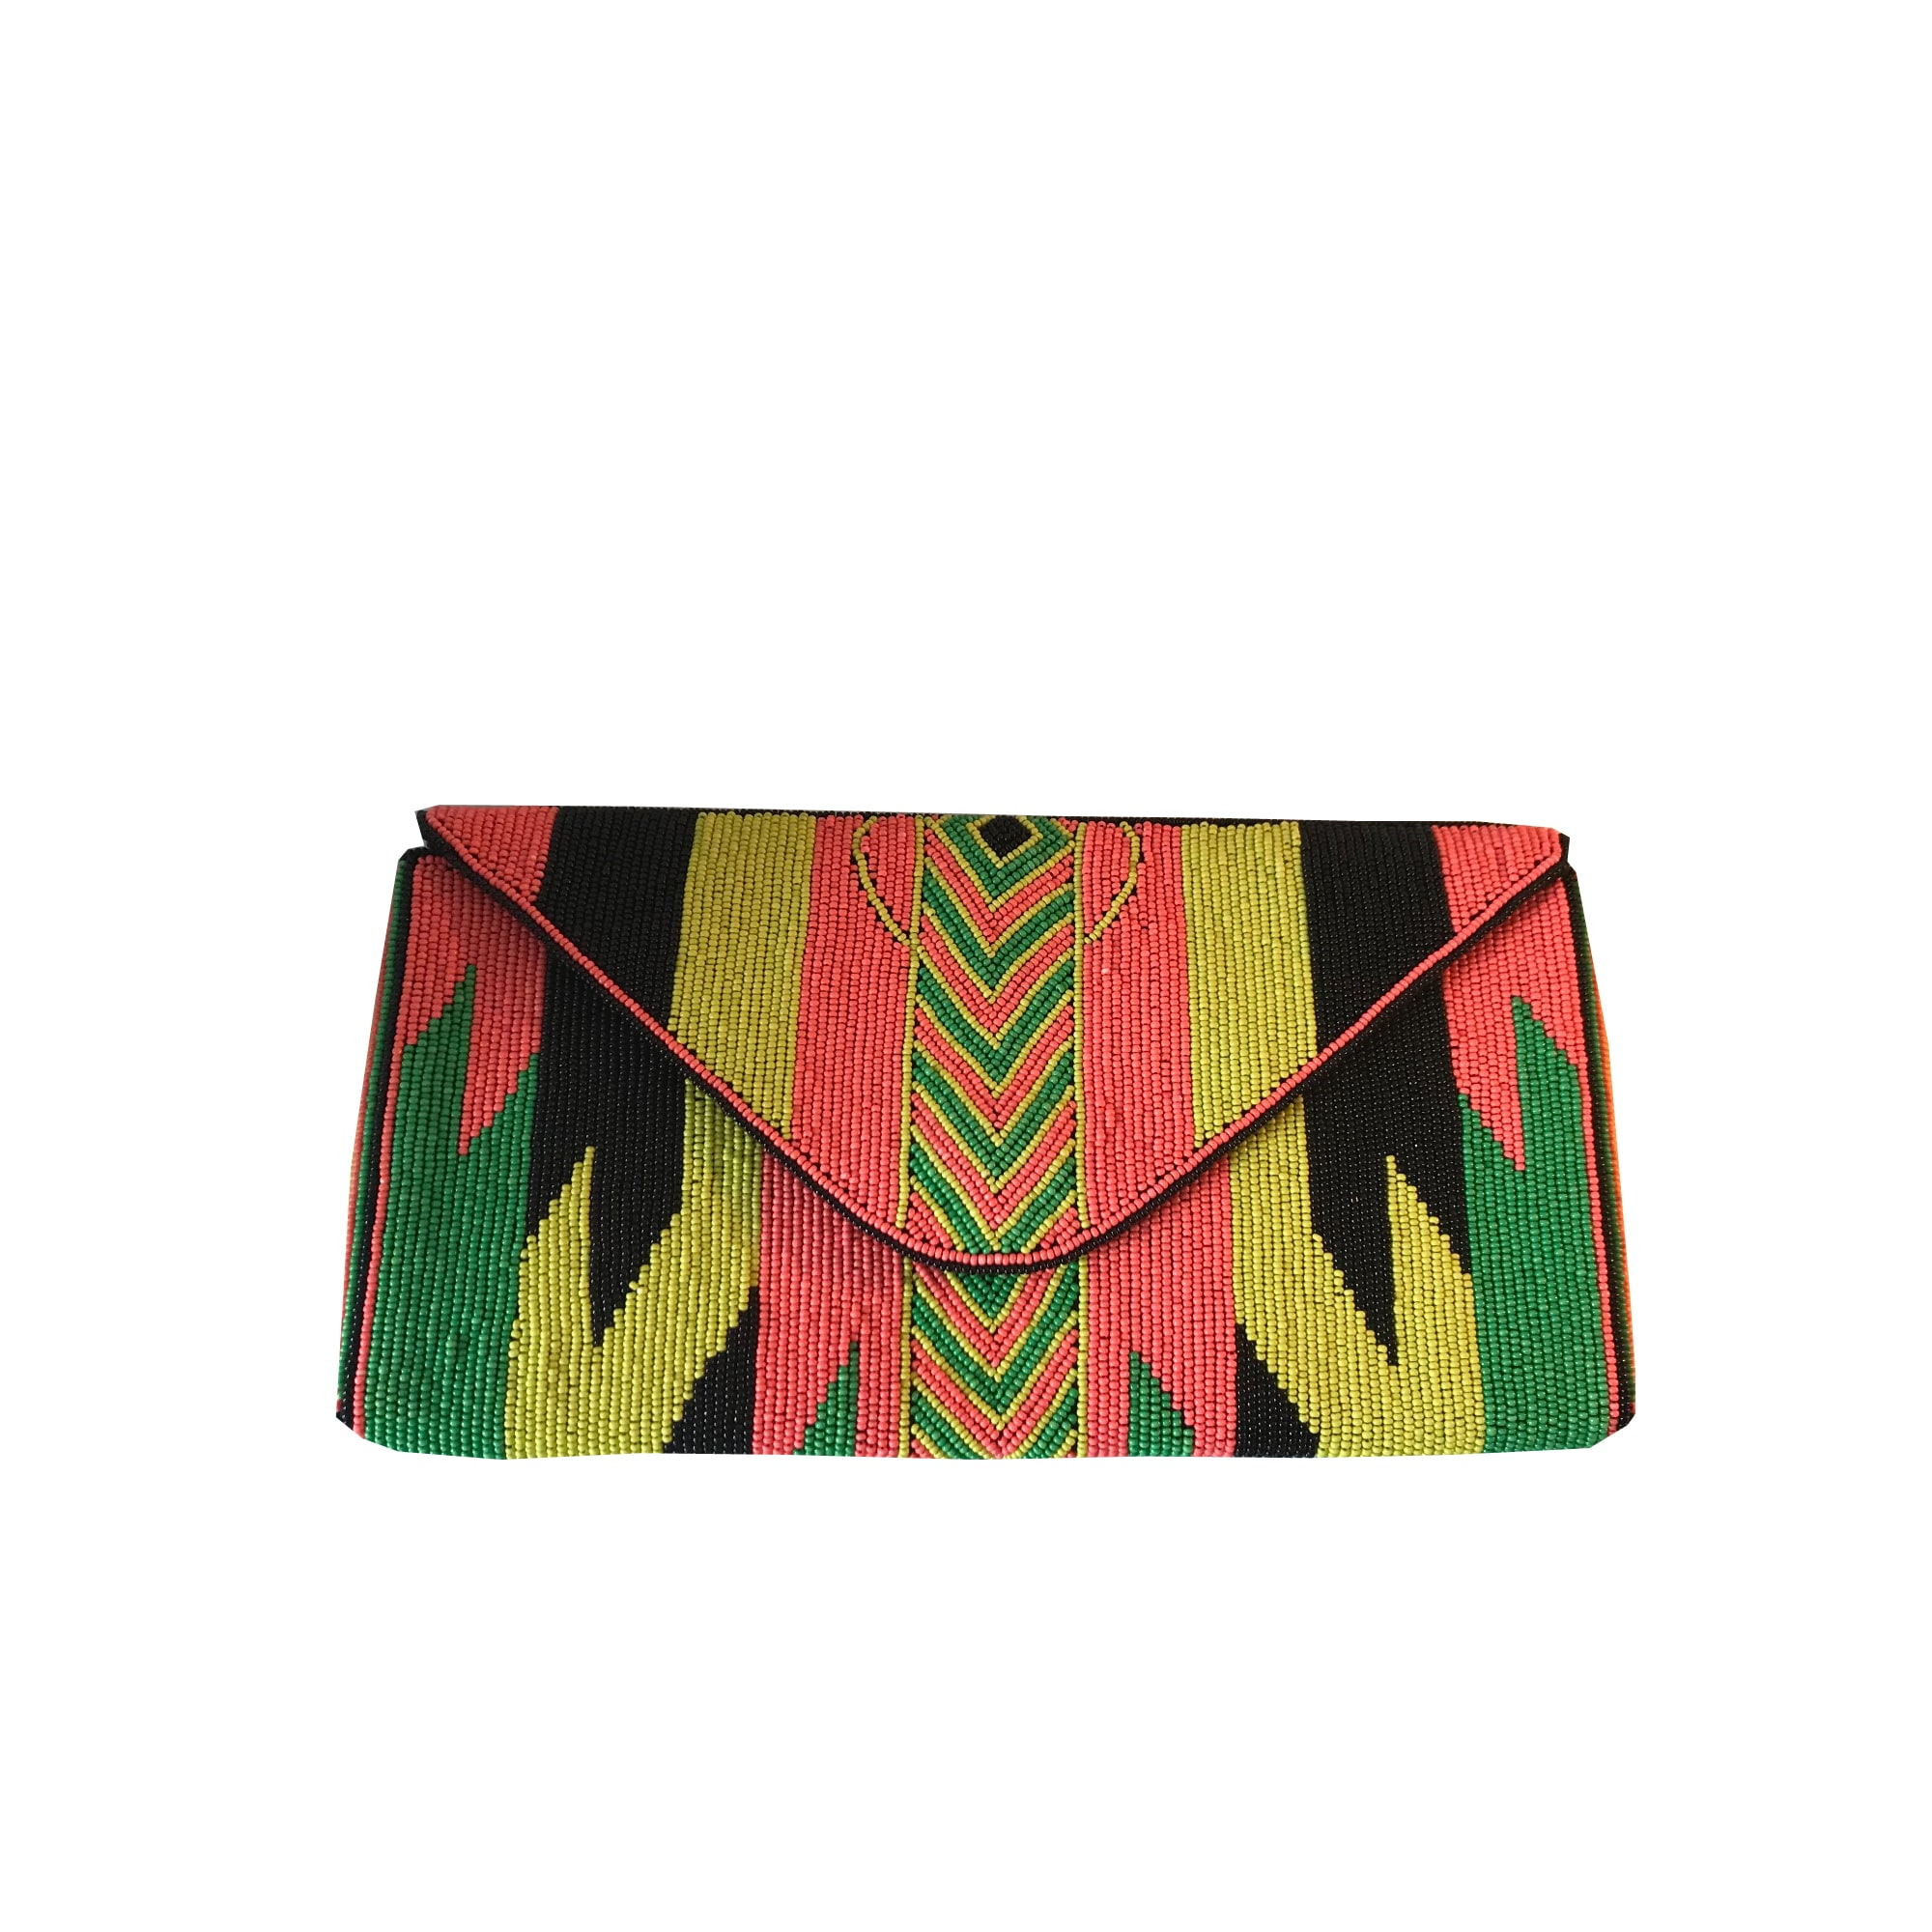 Pochette BA&SH a paillettes multicolore